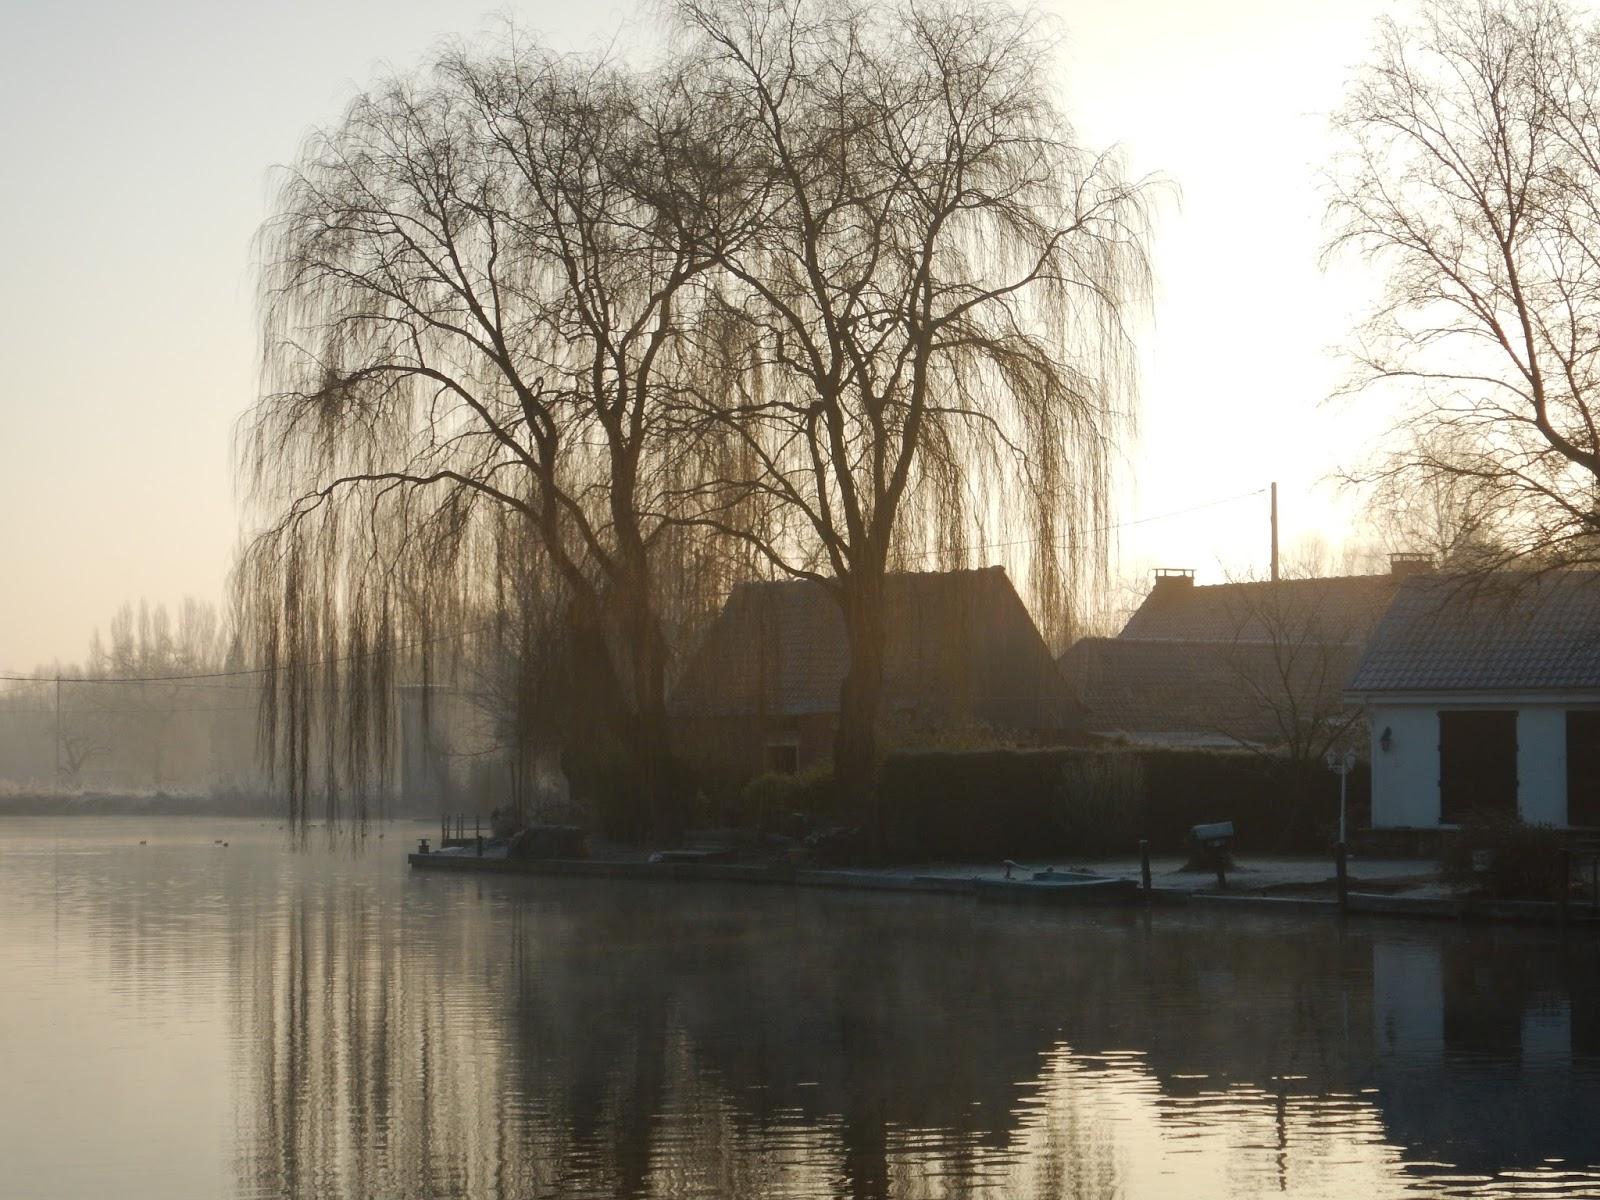 Rando Wardrecques: Le Marais De Tilques Jeudi 19 Janvier 2017